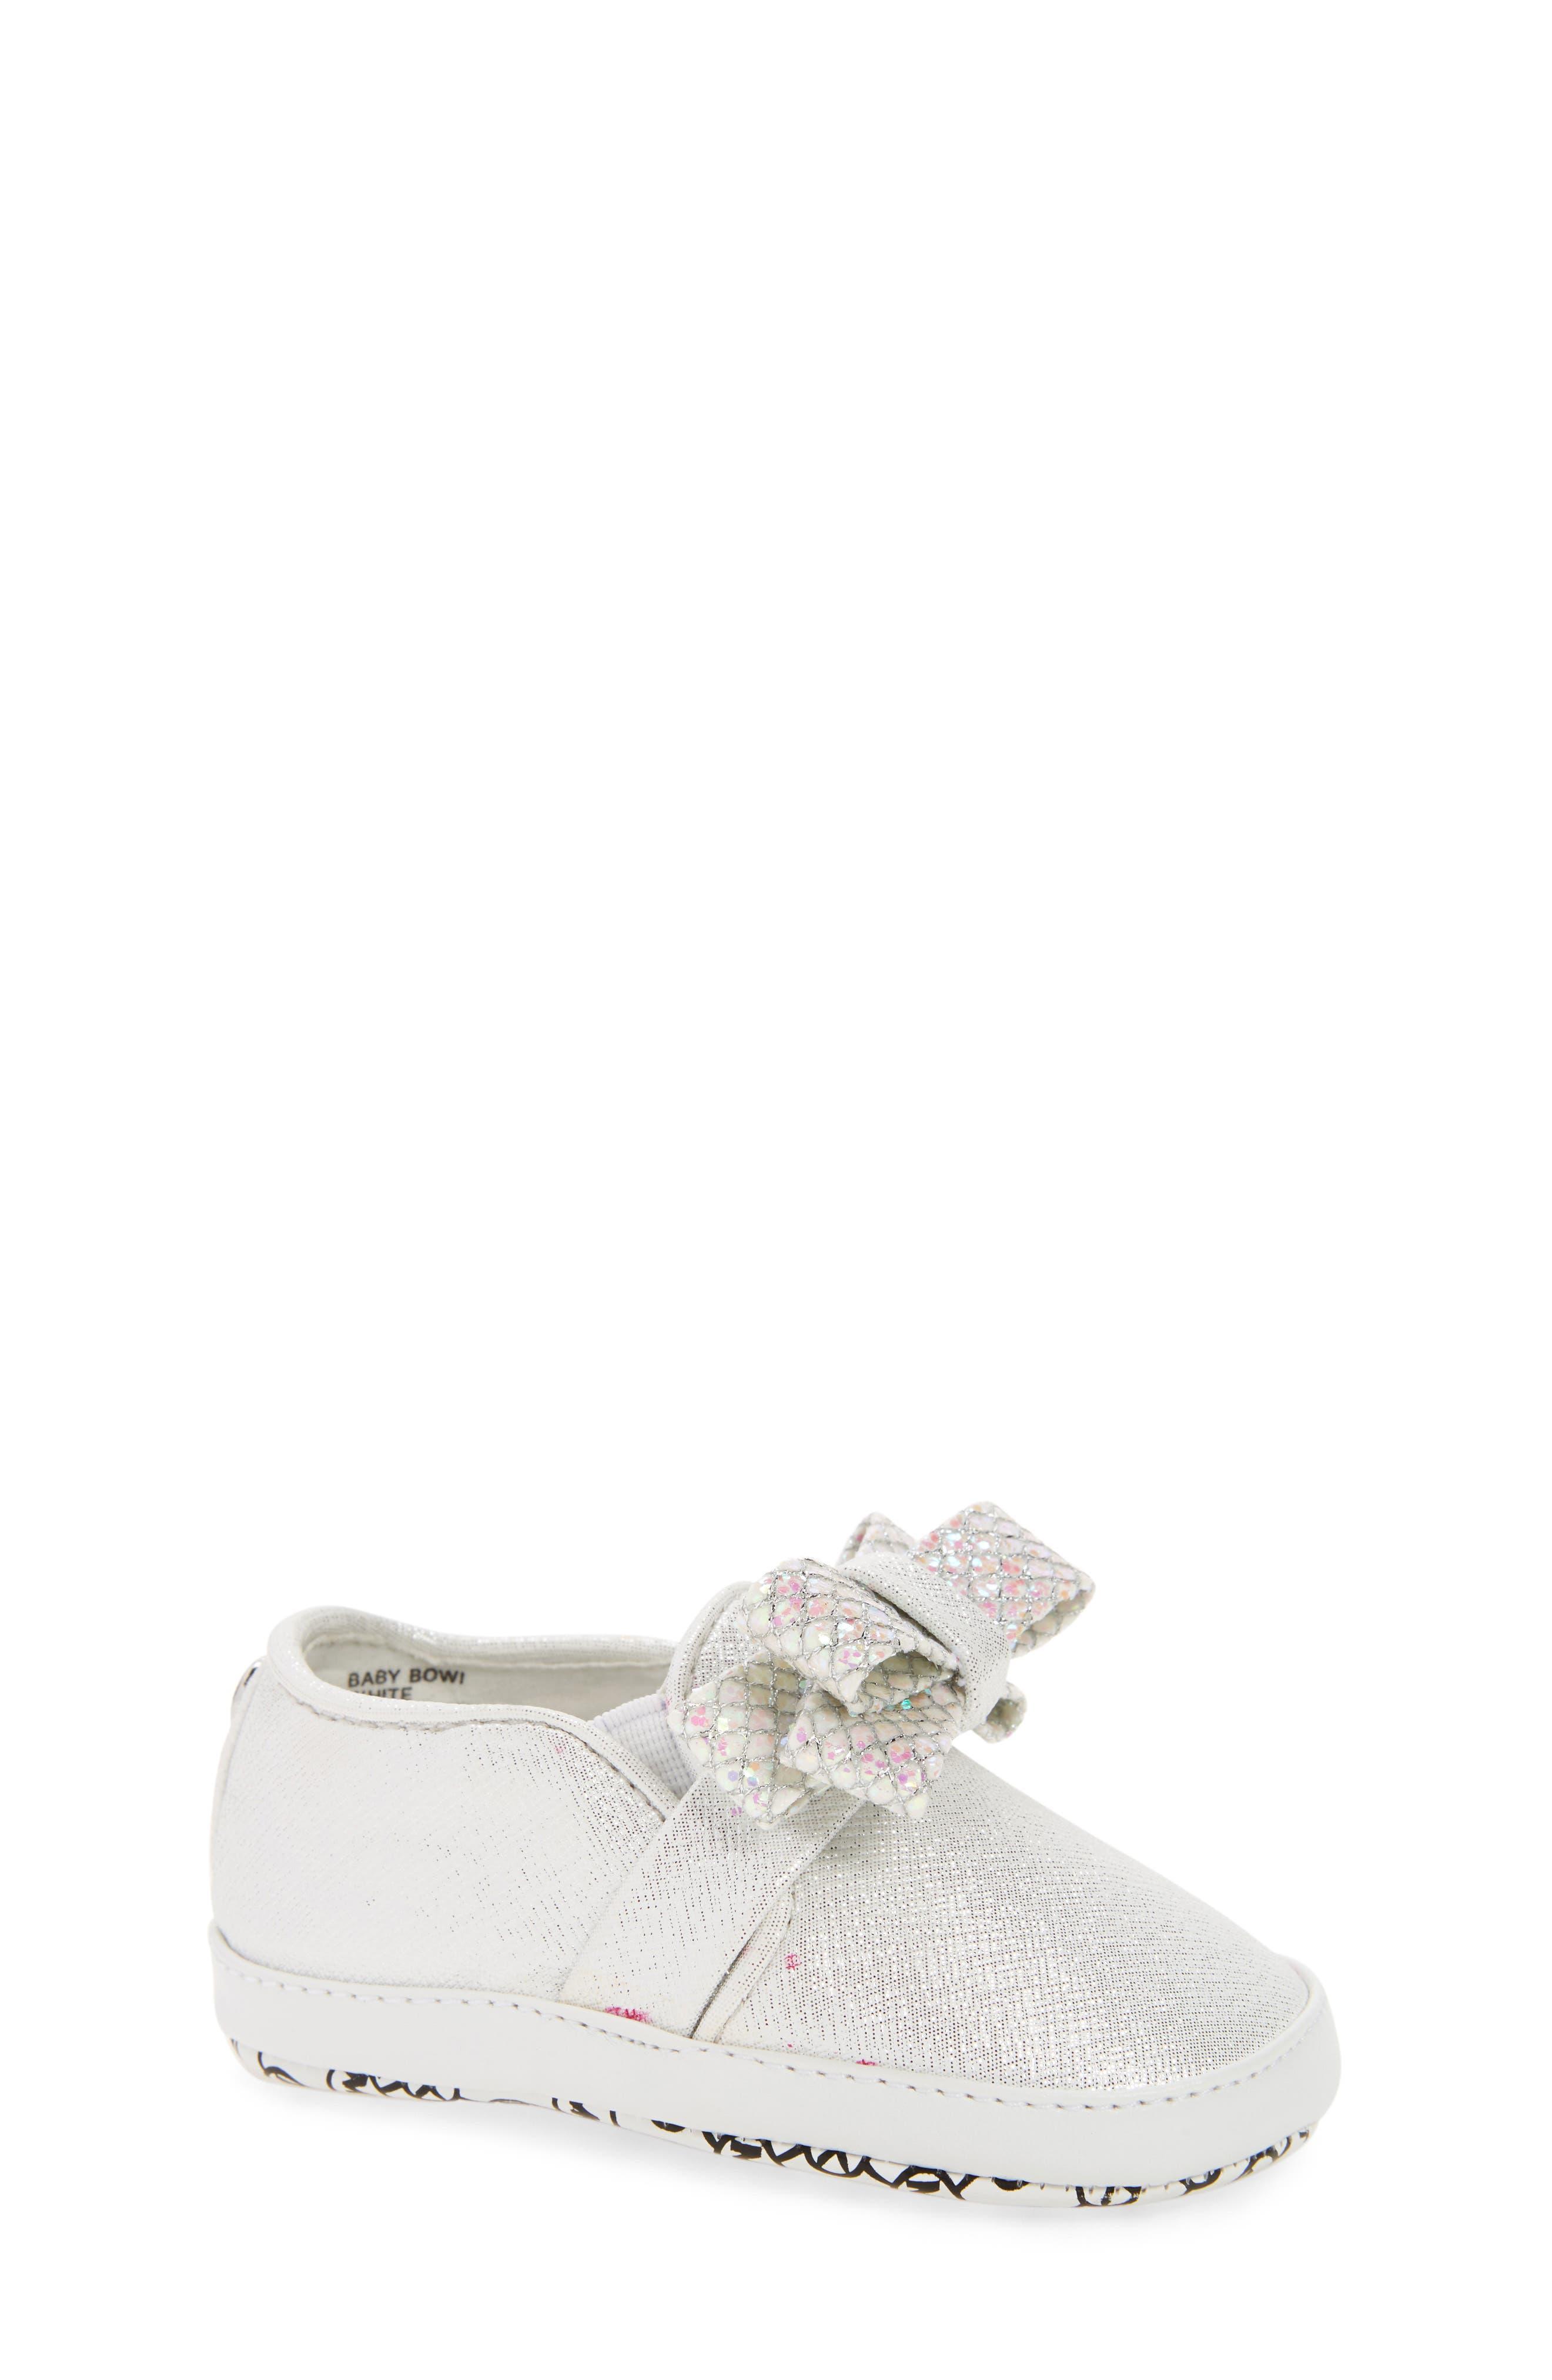 Baby Bowi Metallic Slip-On Crib Shoe,                         Main,                         color, 100